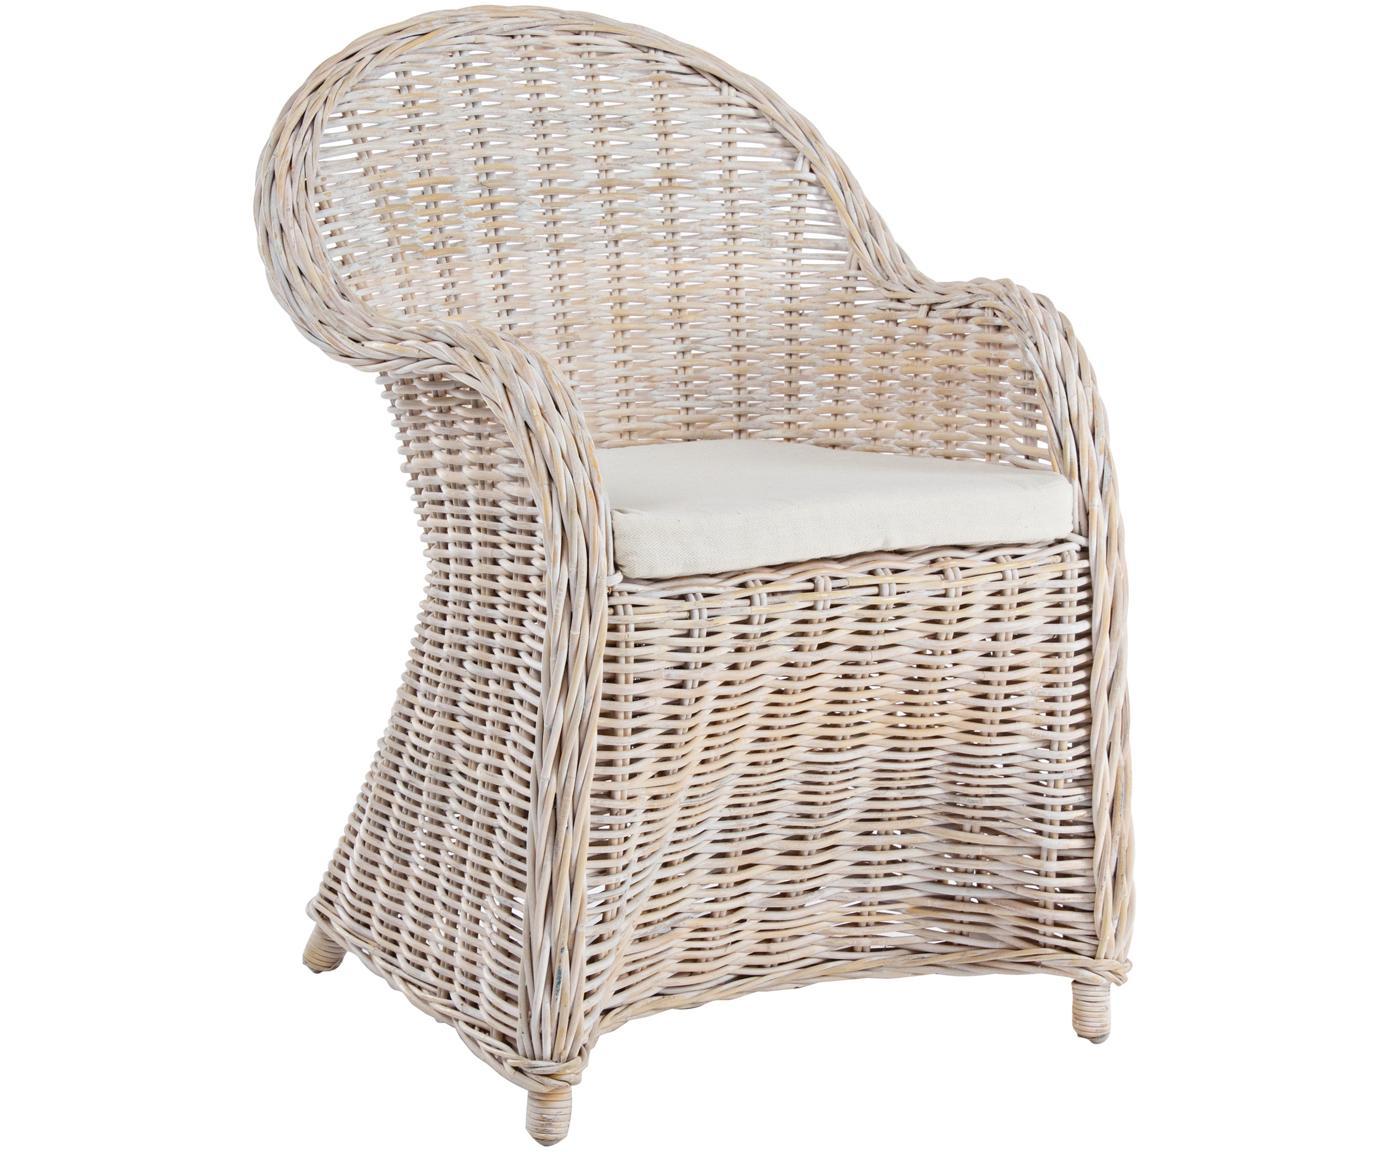 Loungefauteuil Martin, Bekleding: katoen, Rotankleurig, wit, 60 x 89 cm